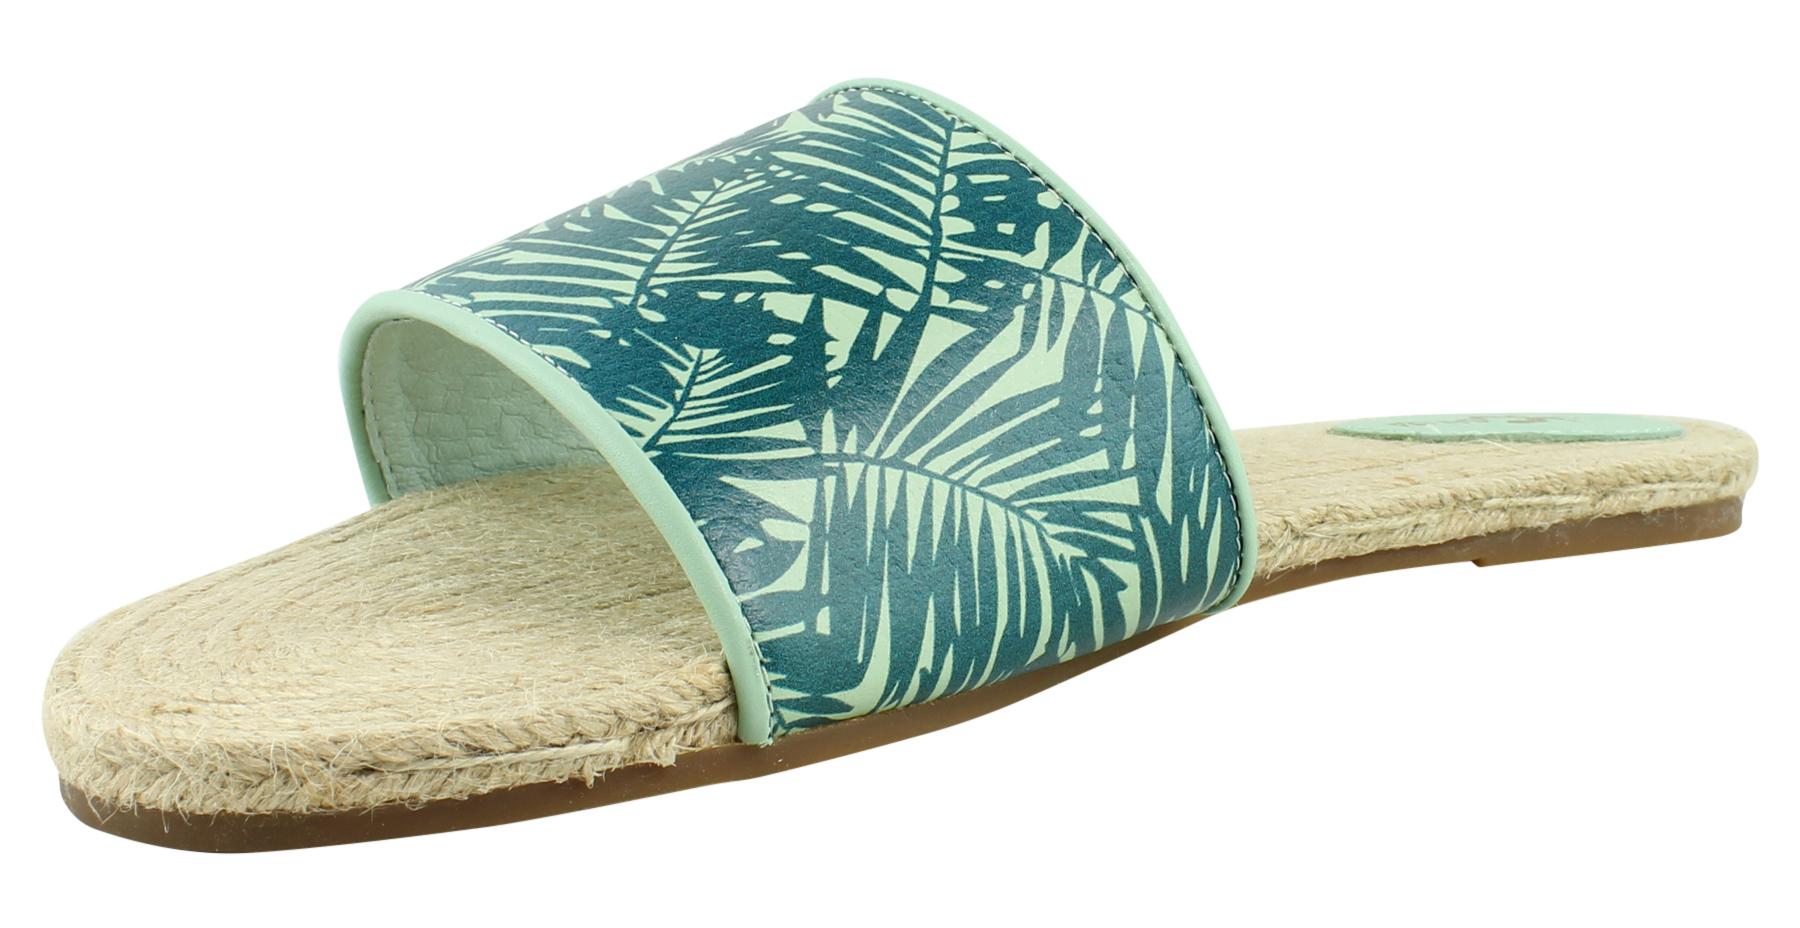 Yosi Samra Womens Sage/Pine Slide Sandals Size 11 New - Walmart.com